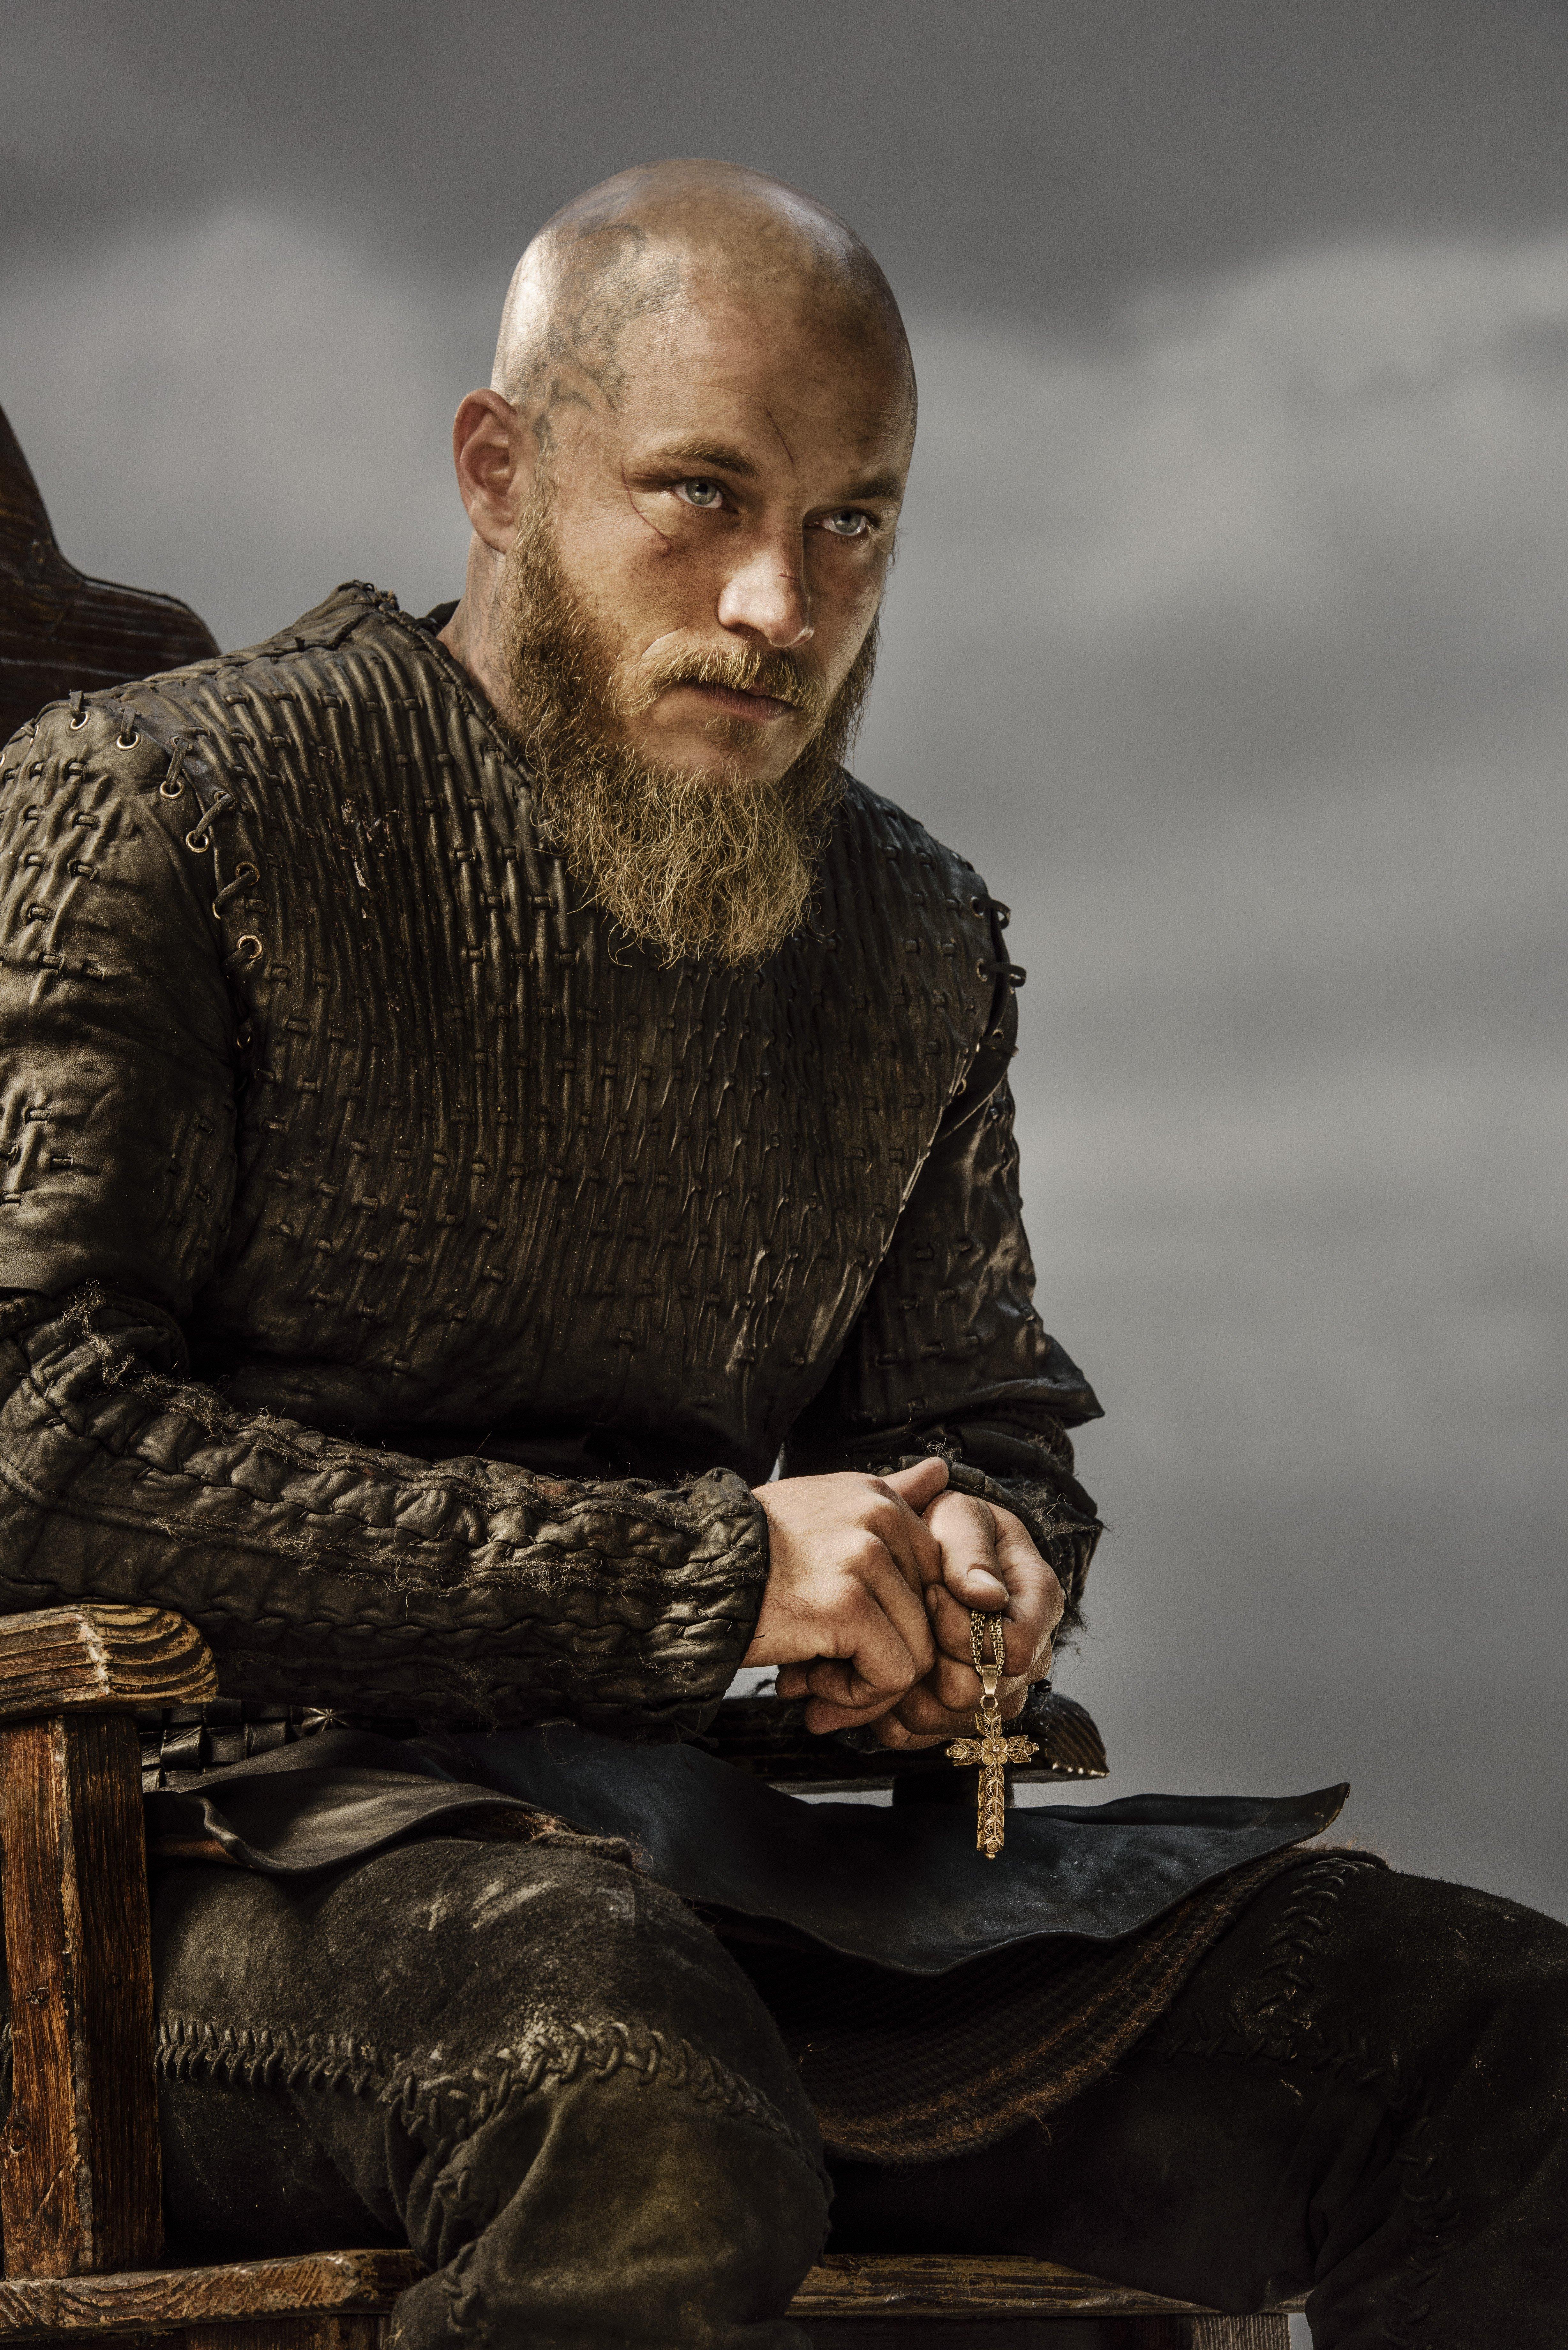 Vikings Ragnar Lothbrok Season 3 Official Picture Vikings Serial Tv Foto 38232023 Fanpop